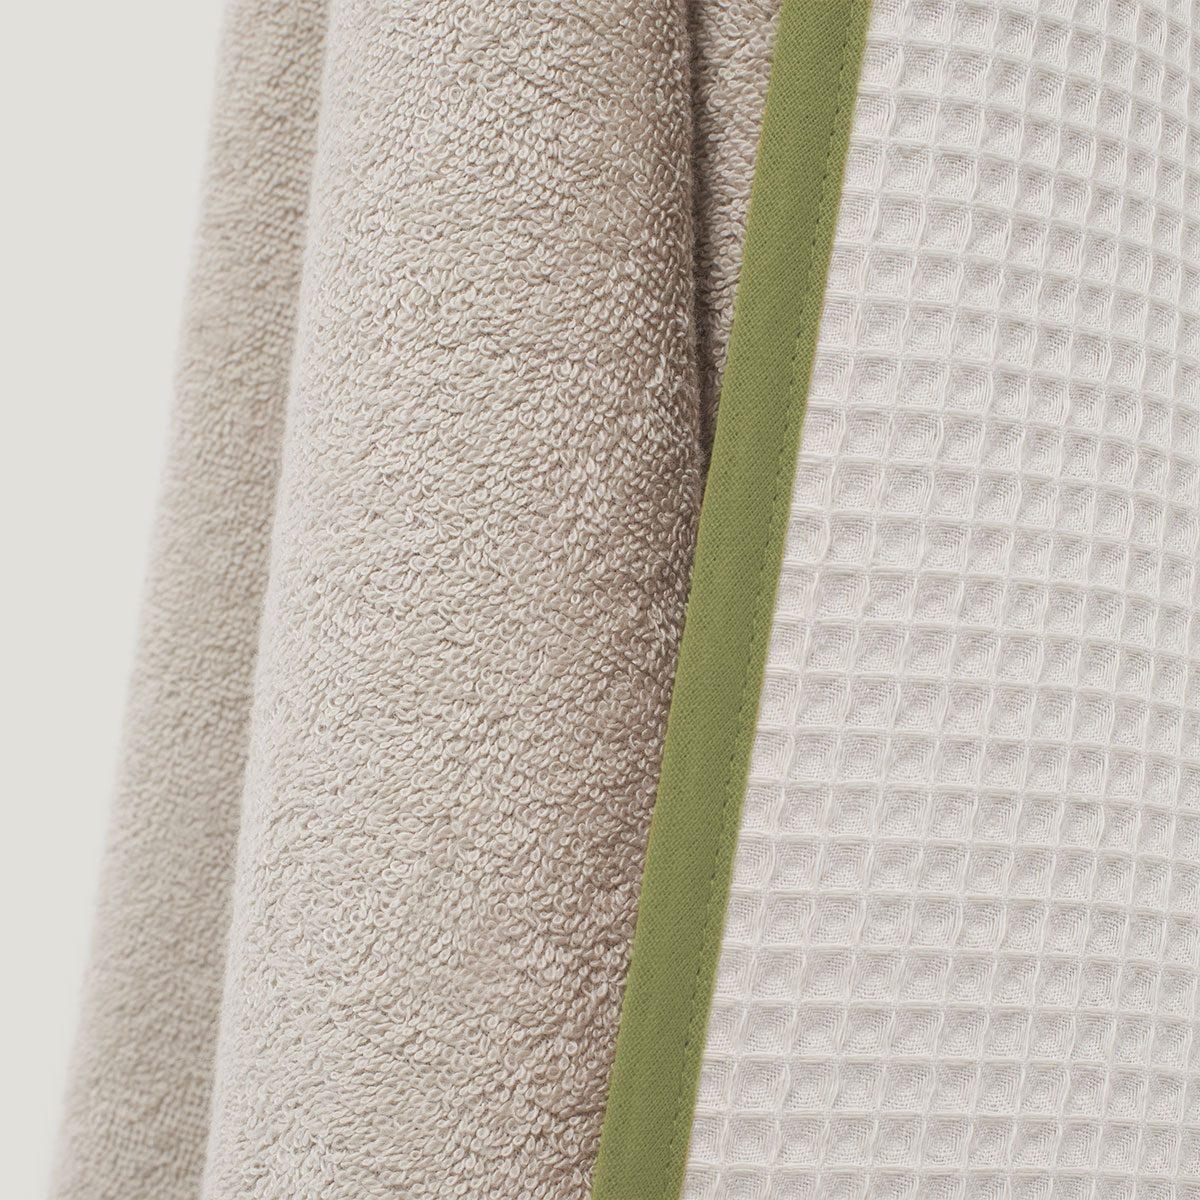 DRIP hooded towel detail olive